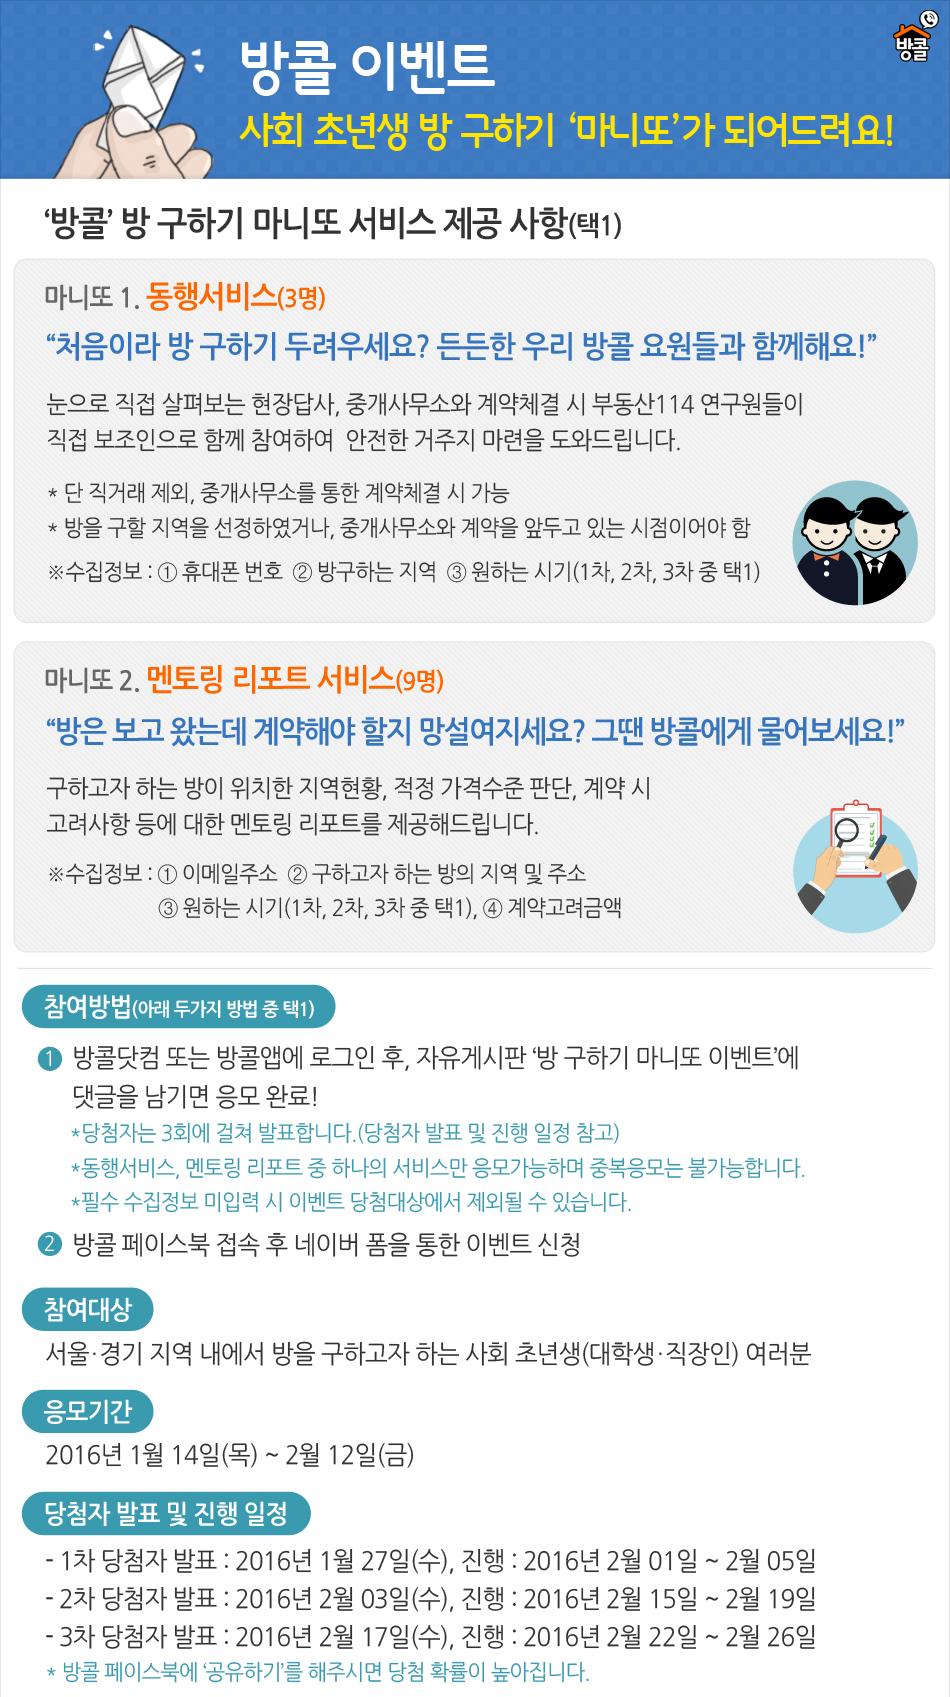 event_bangcall_main_160114_01.jpg